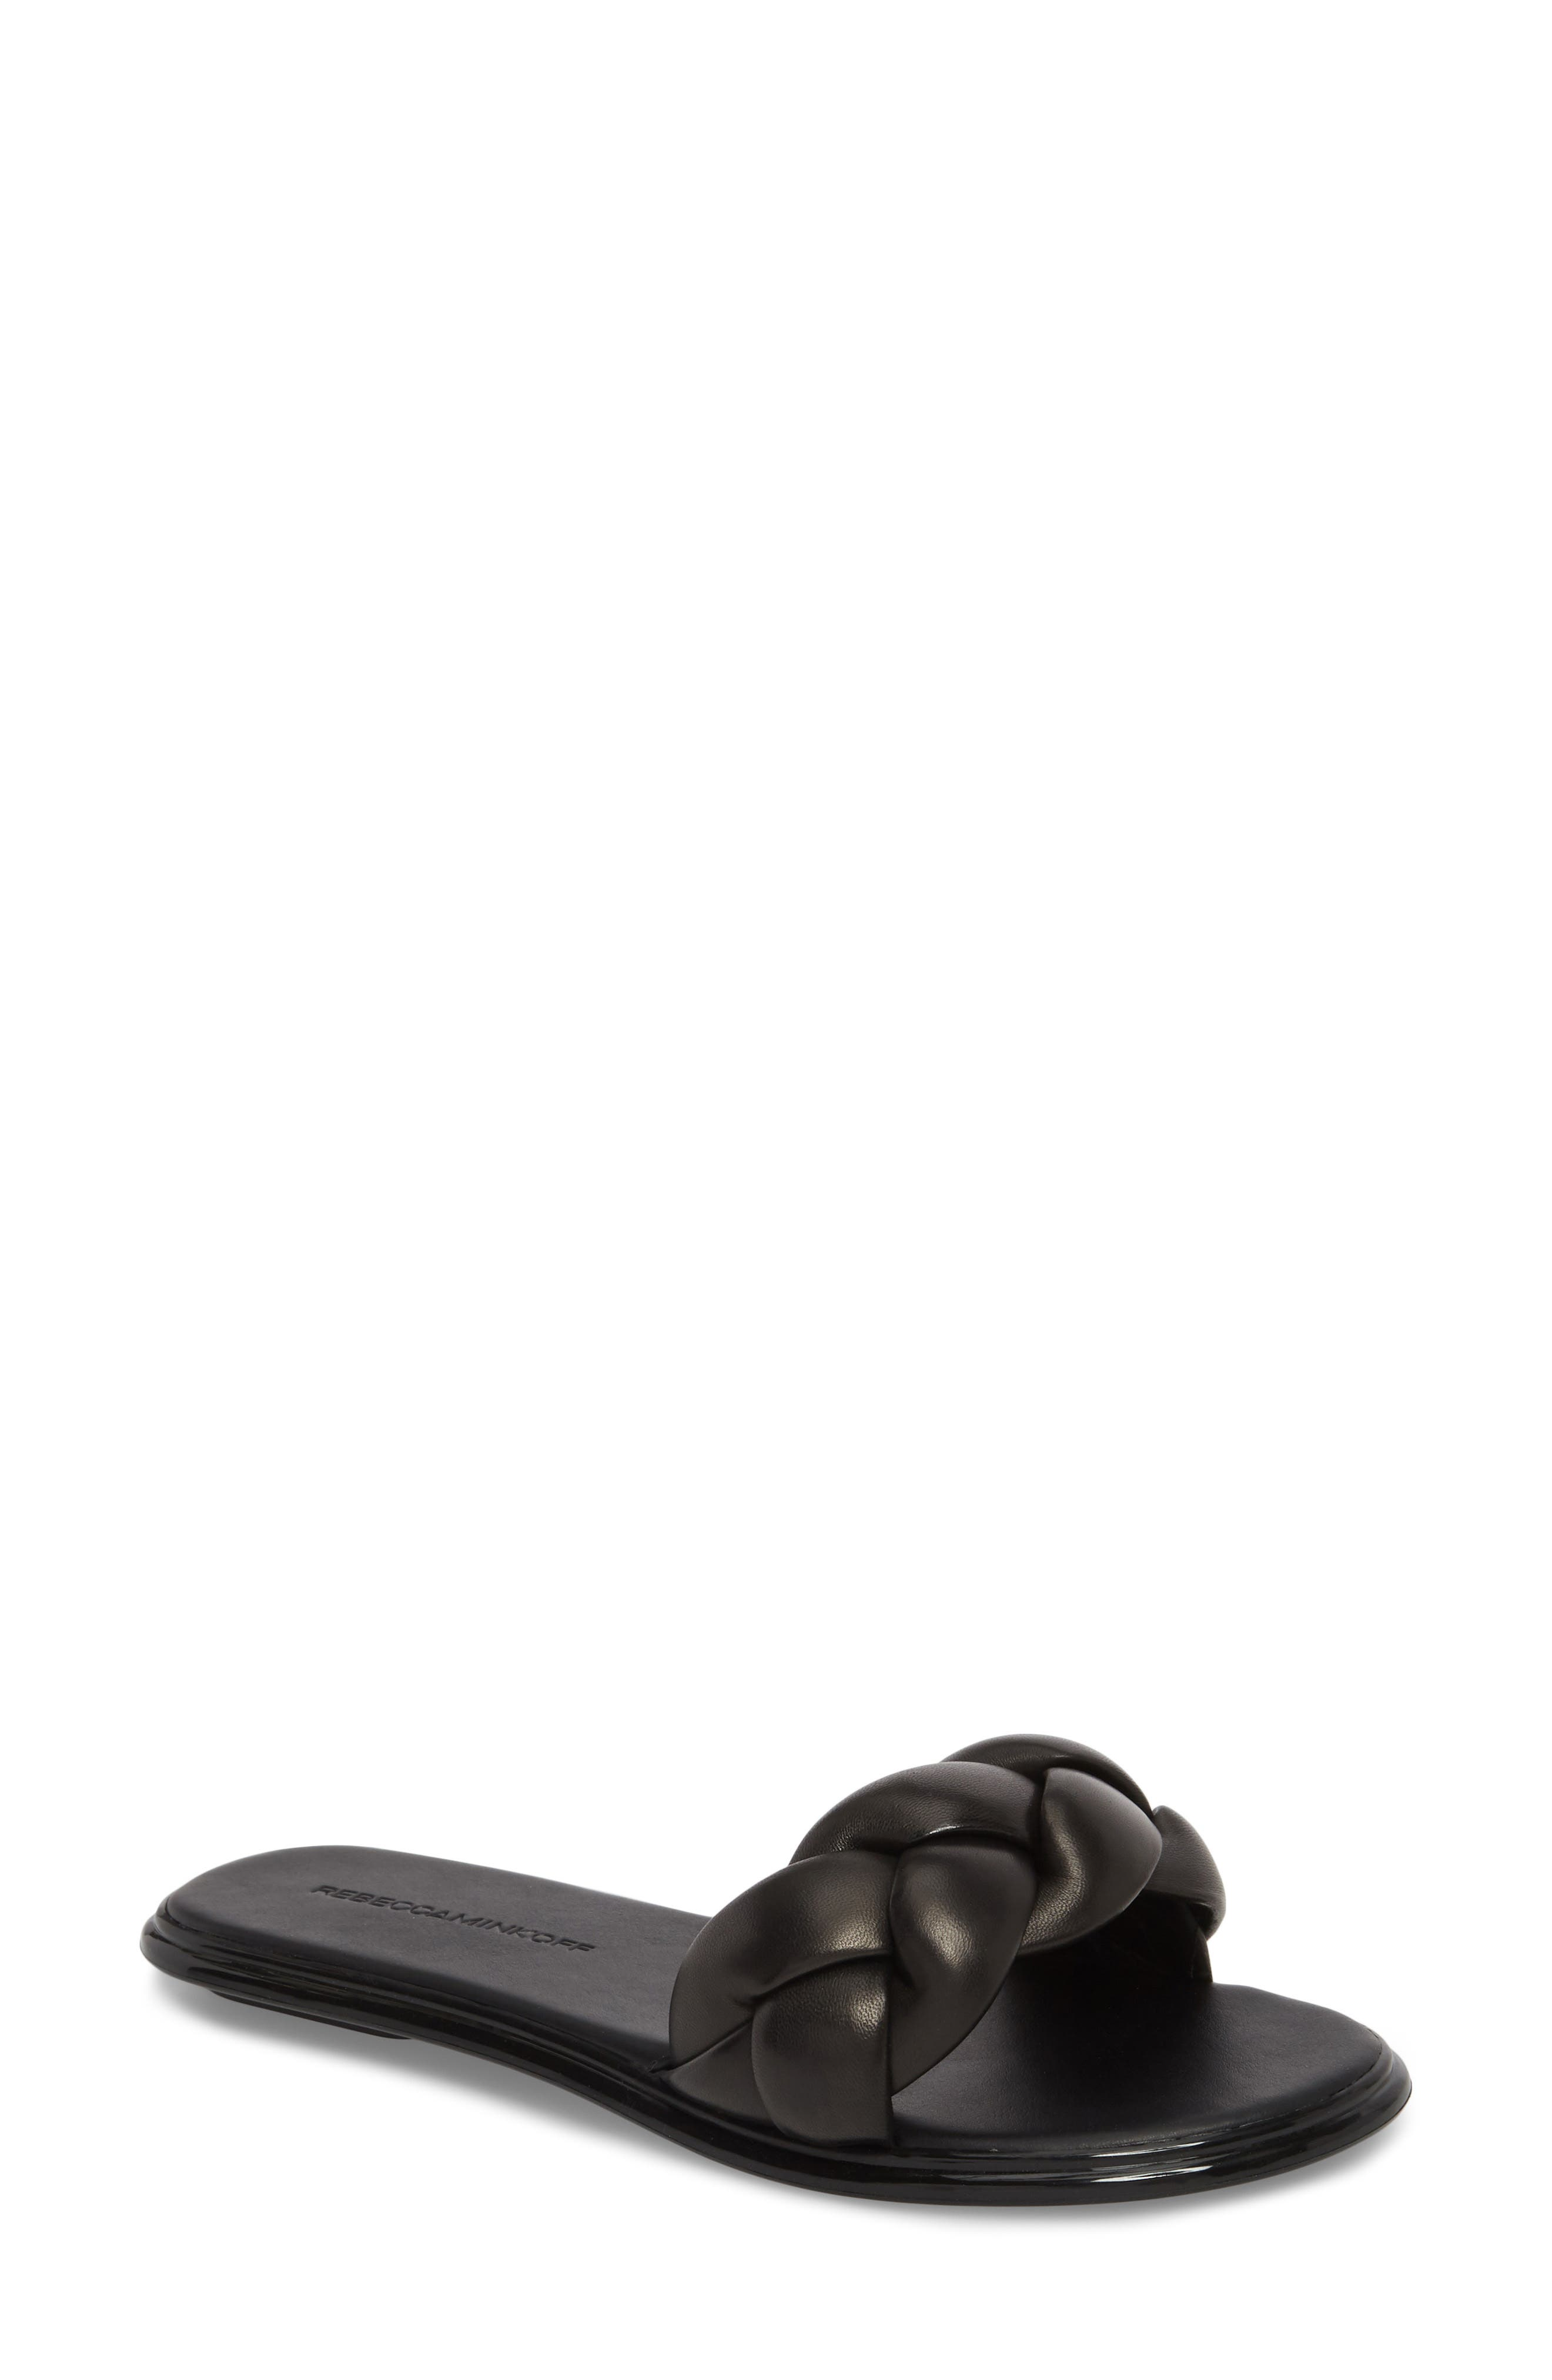 Rebecca Minkoff Women's Palma Slide Sandal P80Vxs